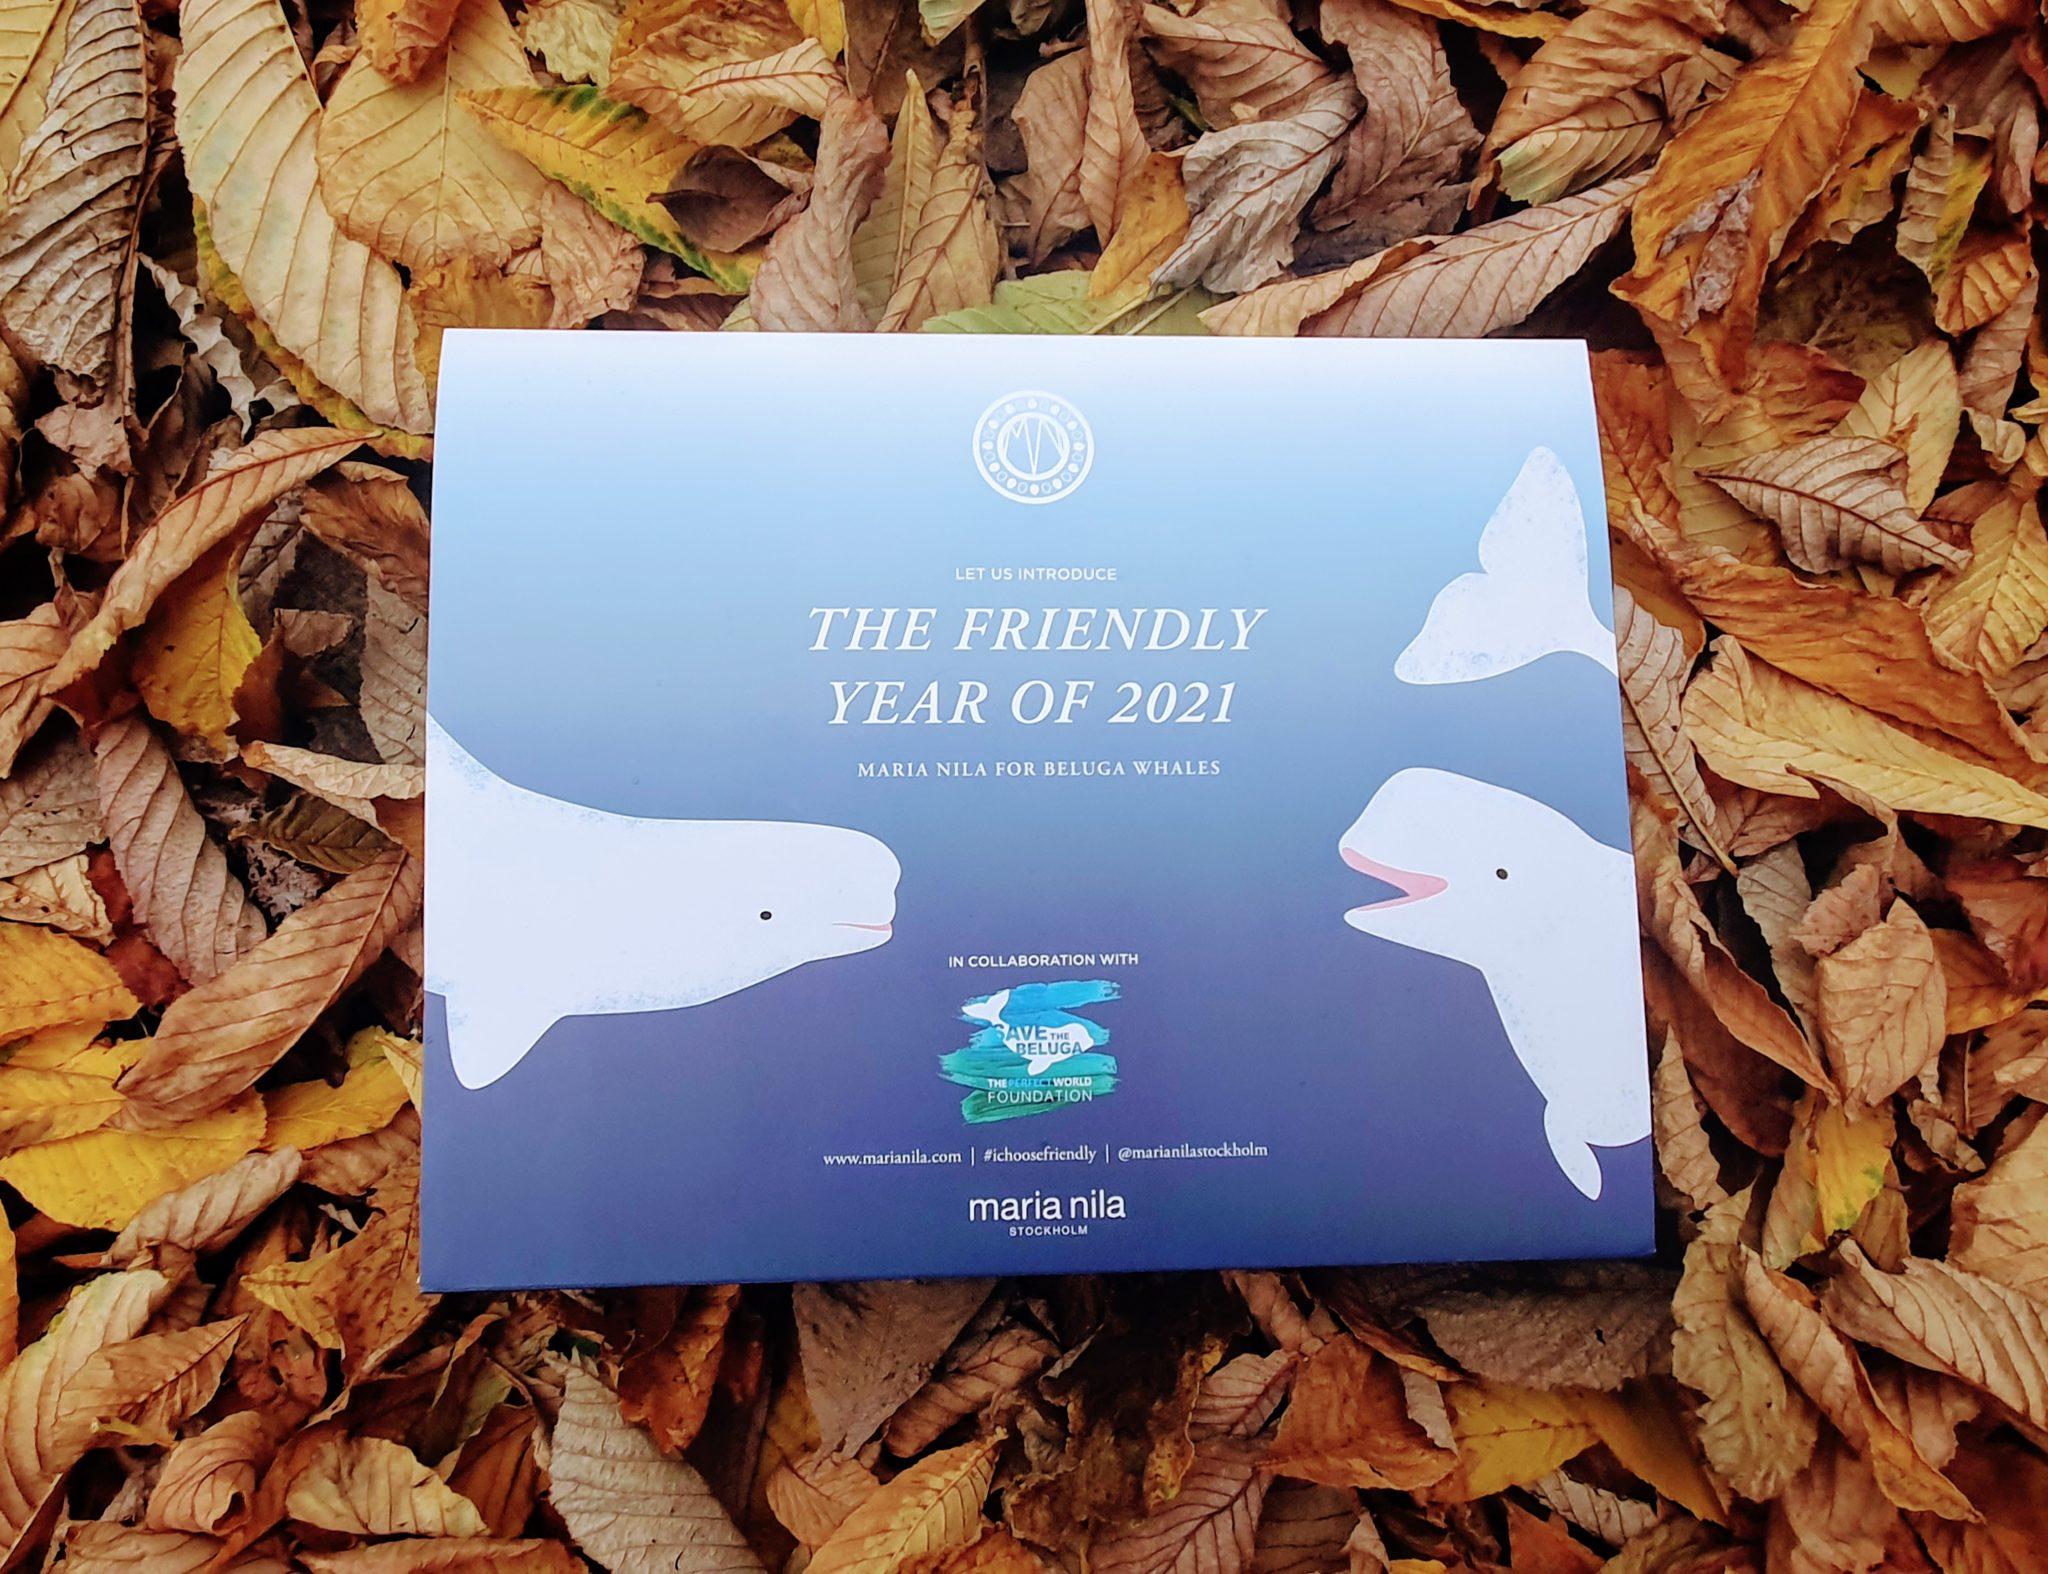 Sea Life Trust's Beluga Whale Maria Nila